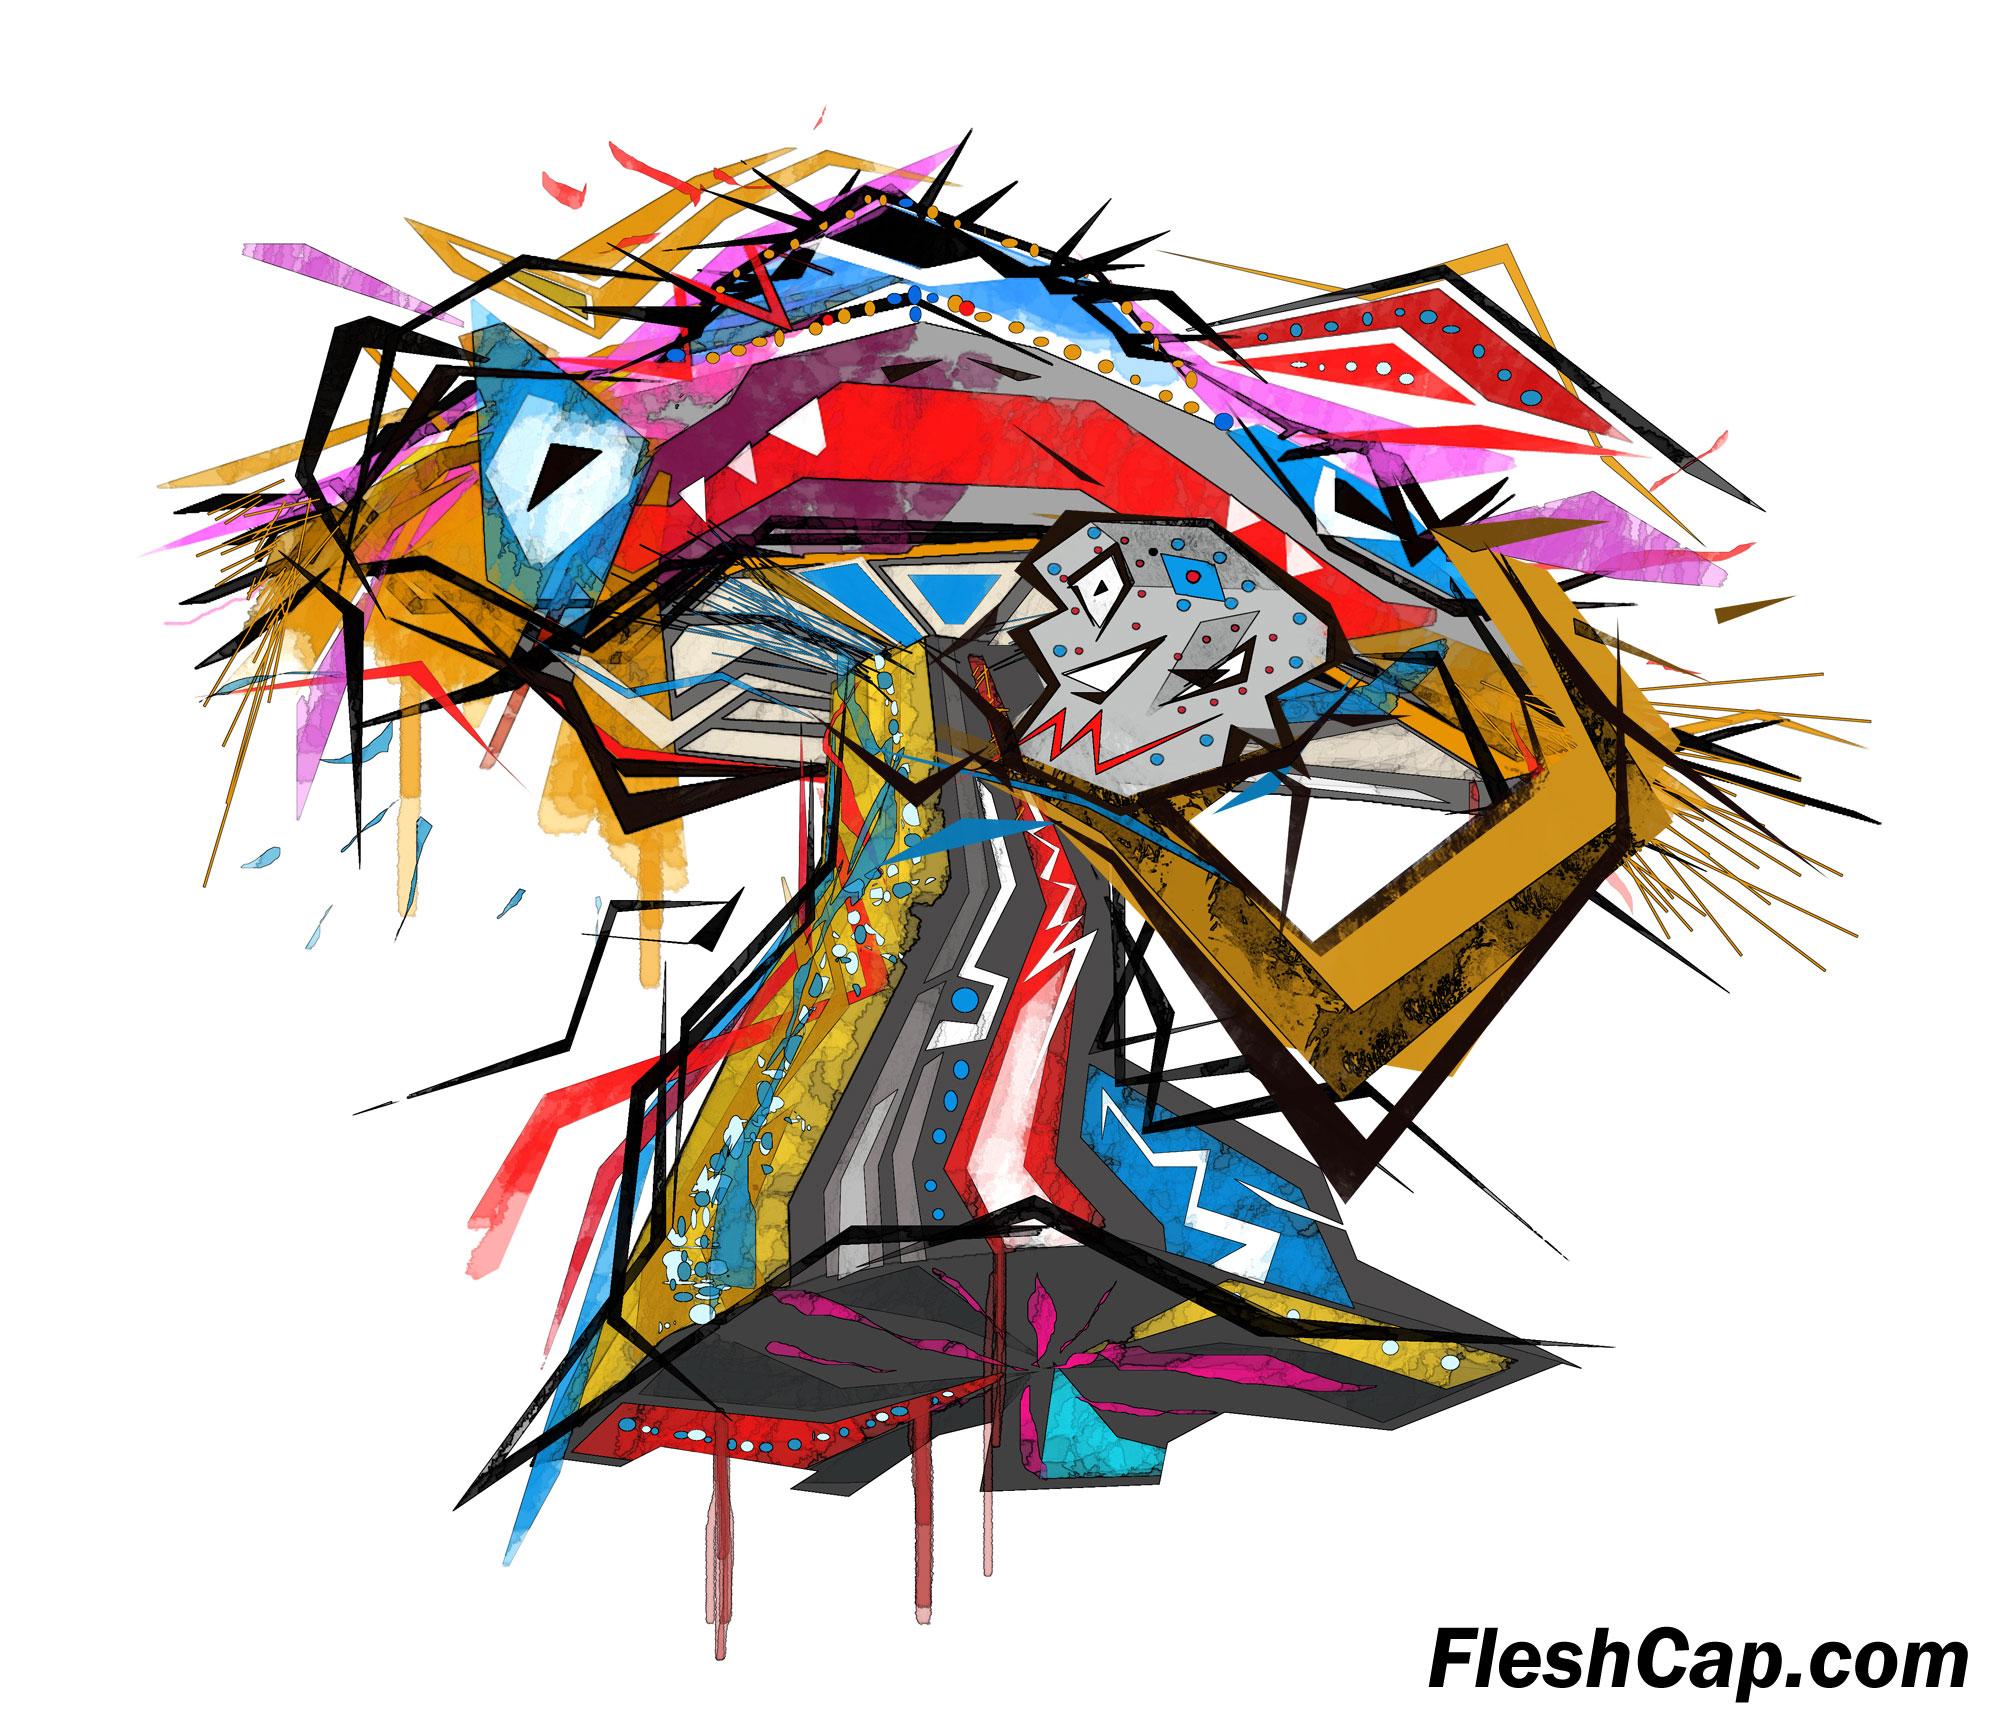 Fleshcap Mushroom by Enrique